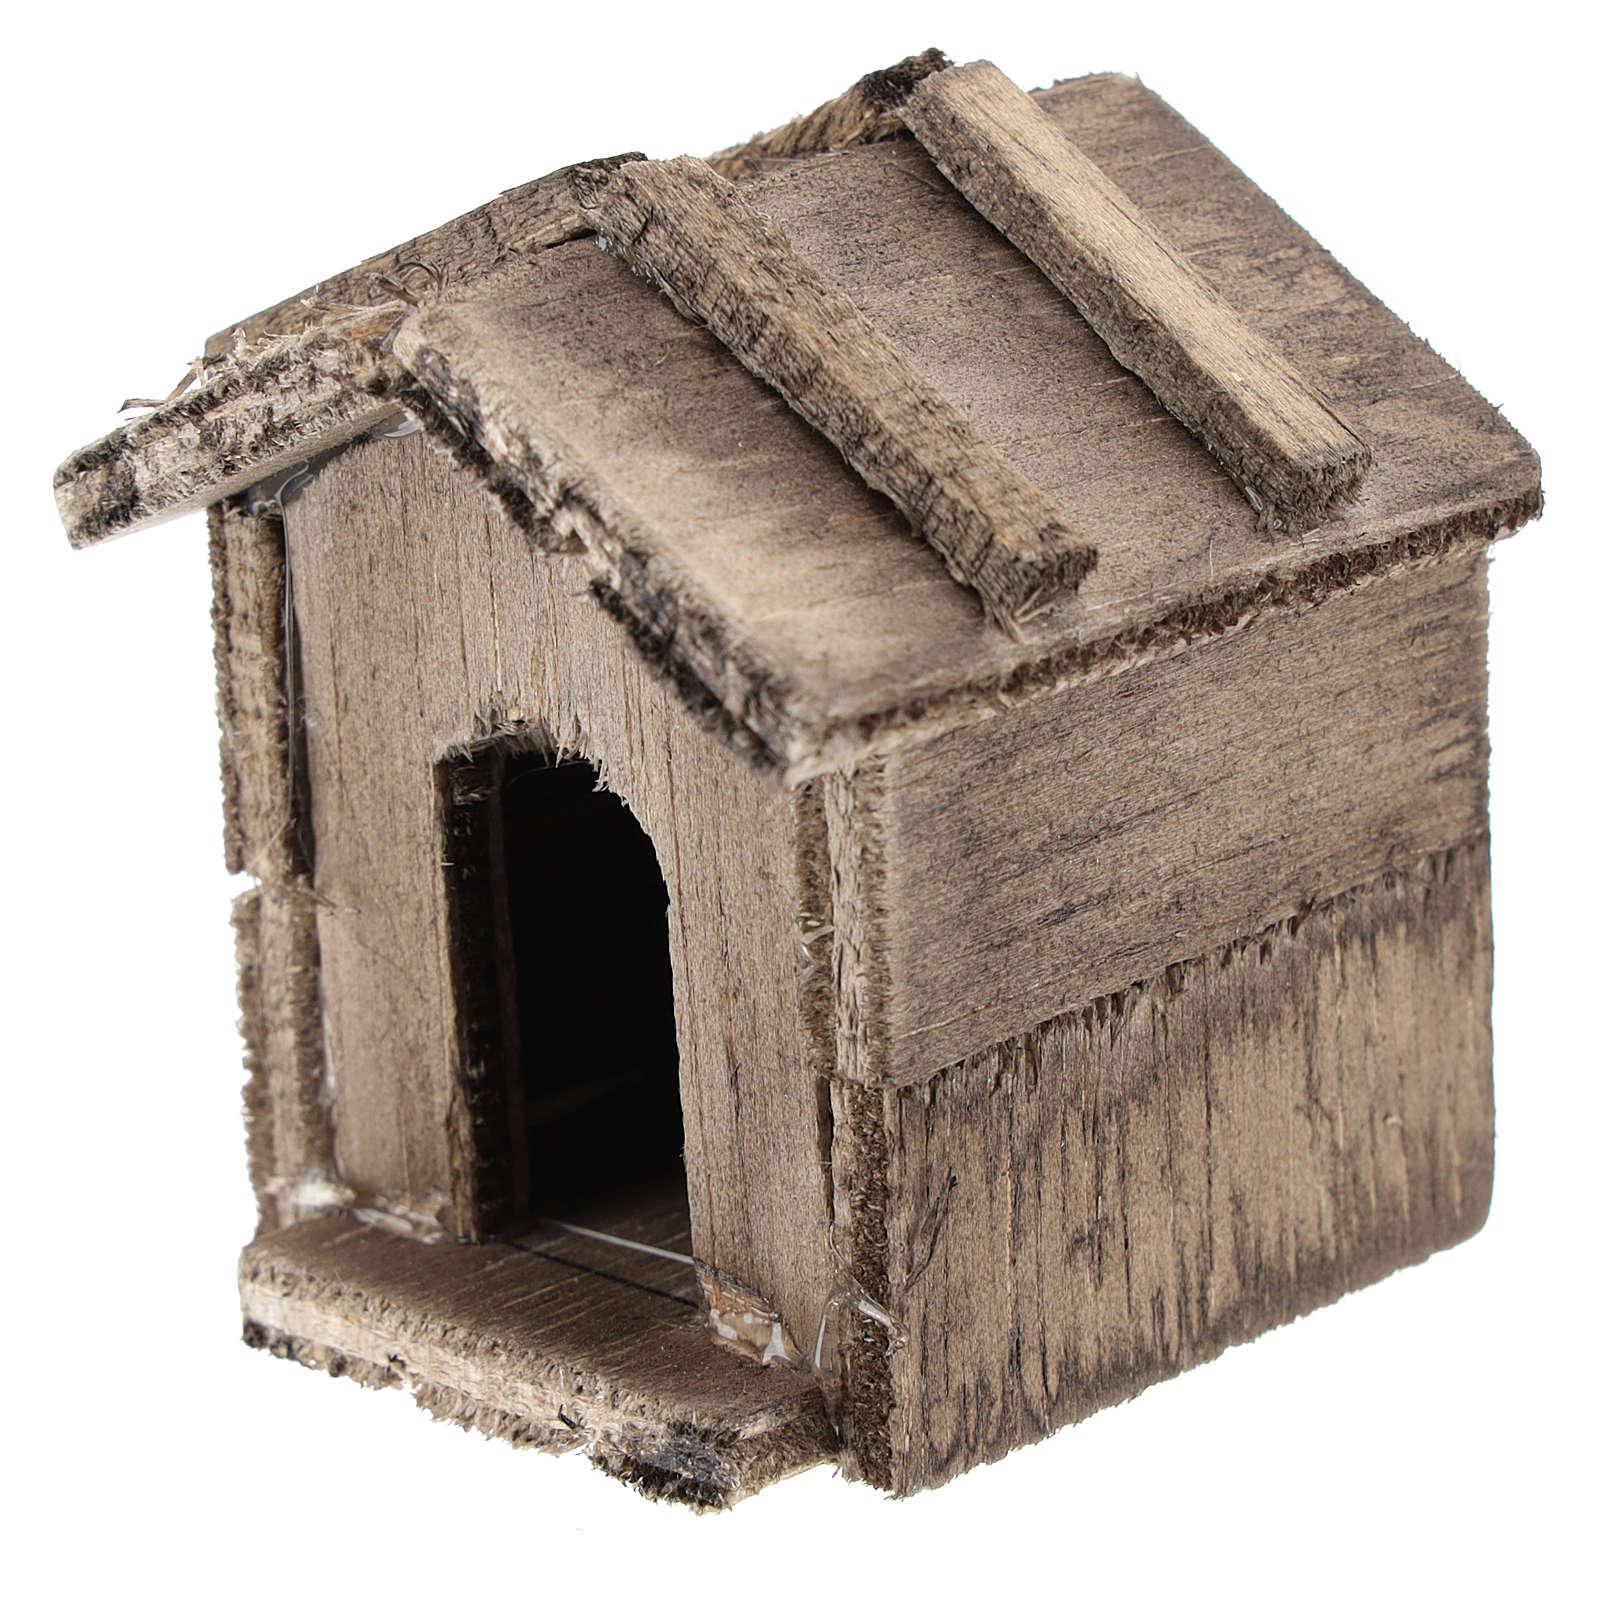 Cuccia semplice in legno per presepi di 10 cm 4